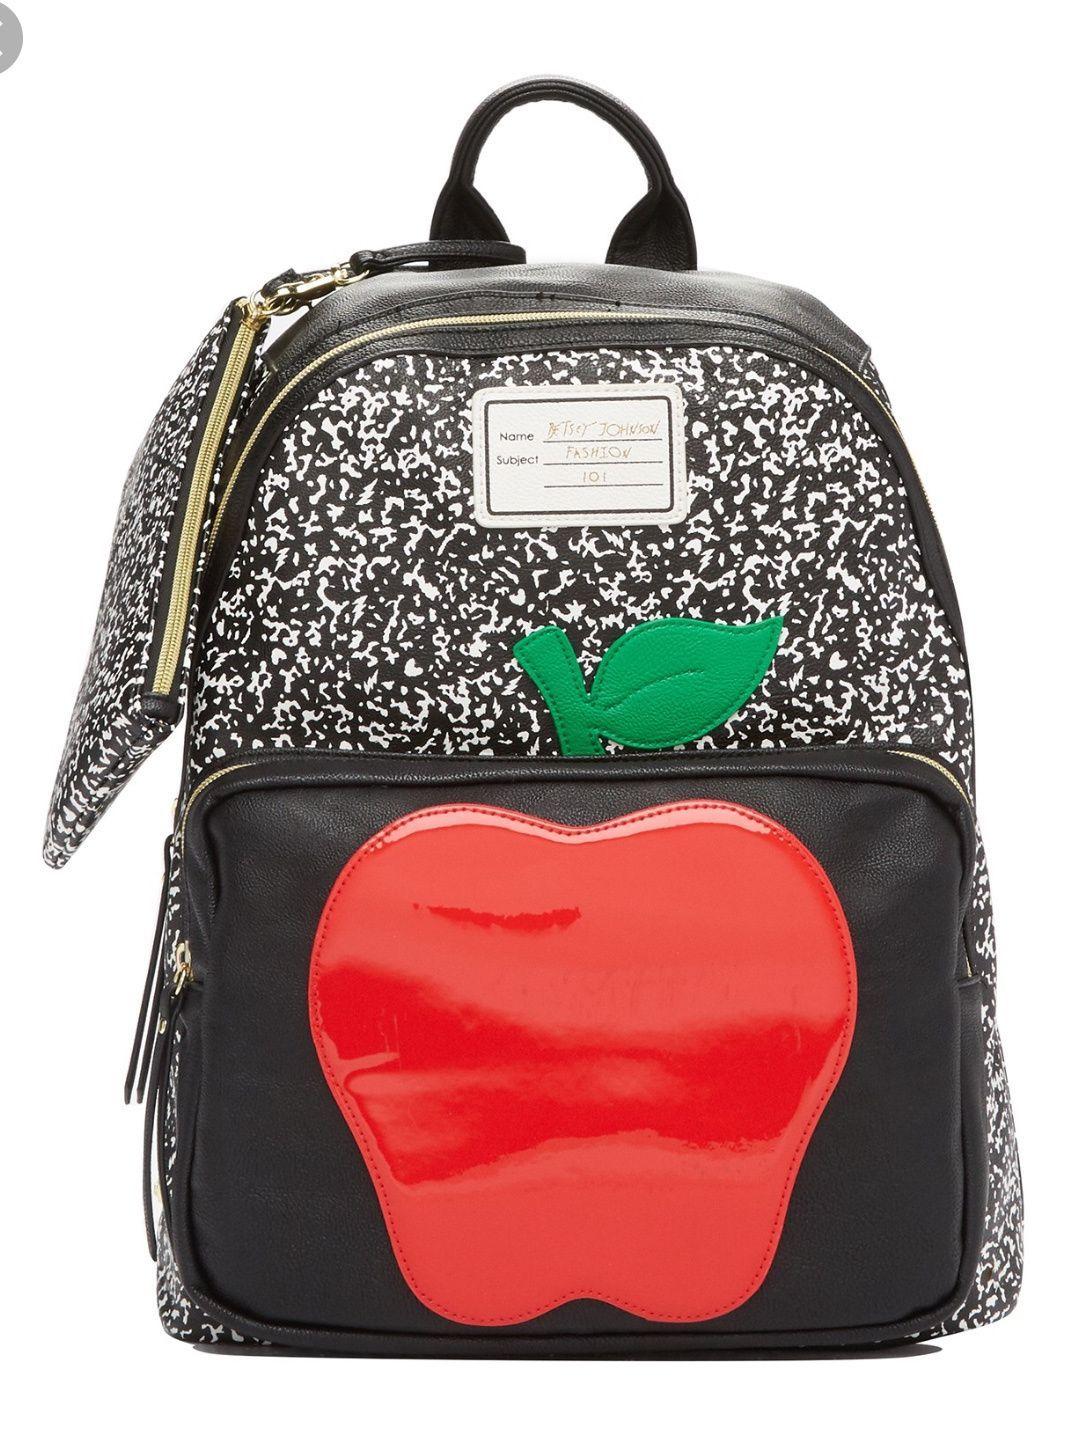 15c40c2381a7 Betsey Johnson Apple black backpack